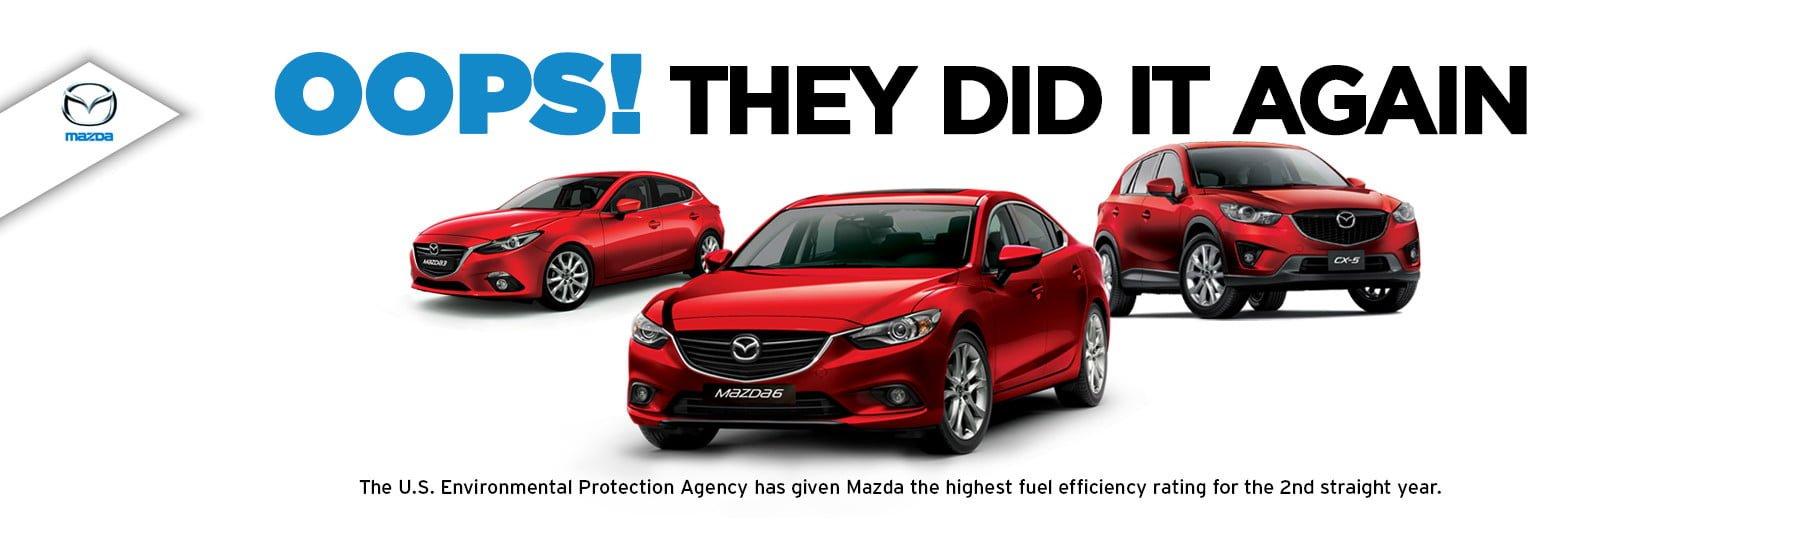 Mazda - Good Cars, Insulting Dealership